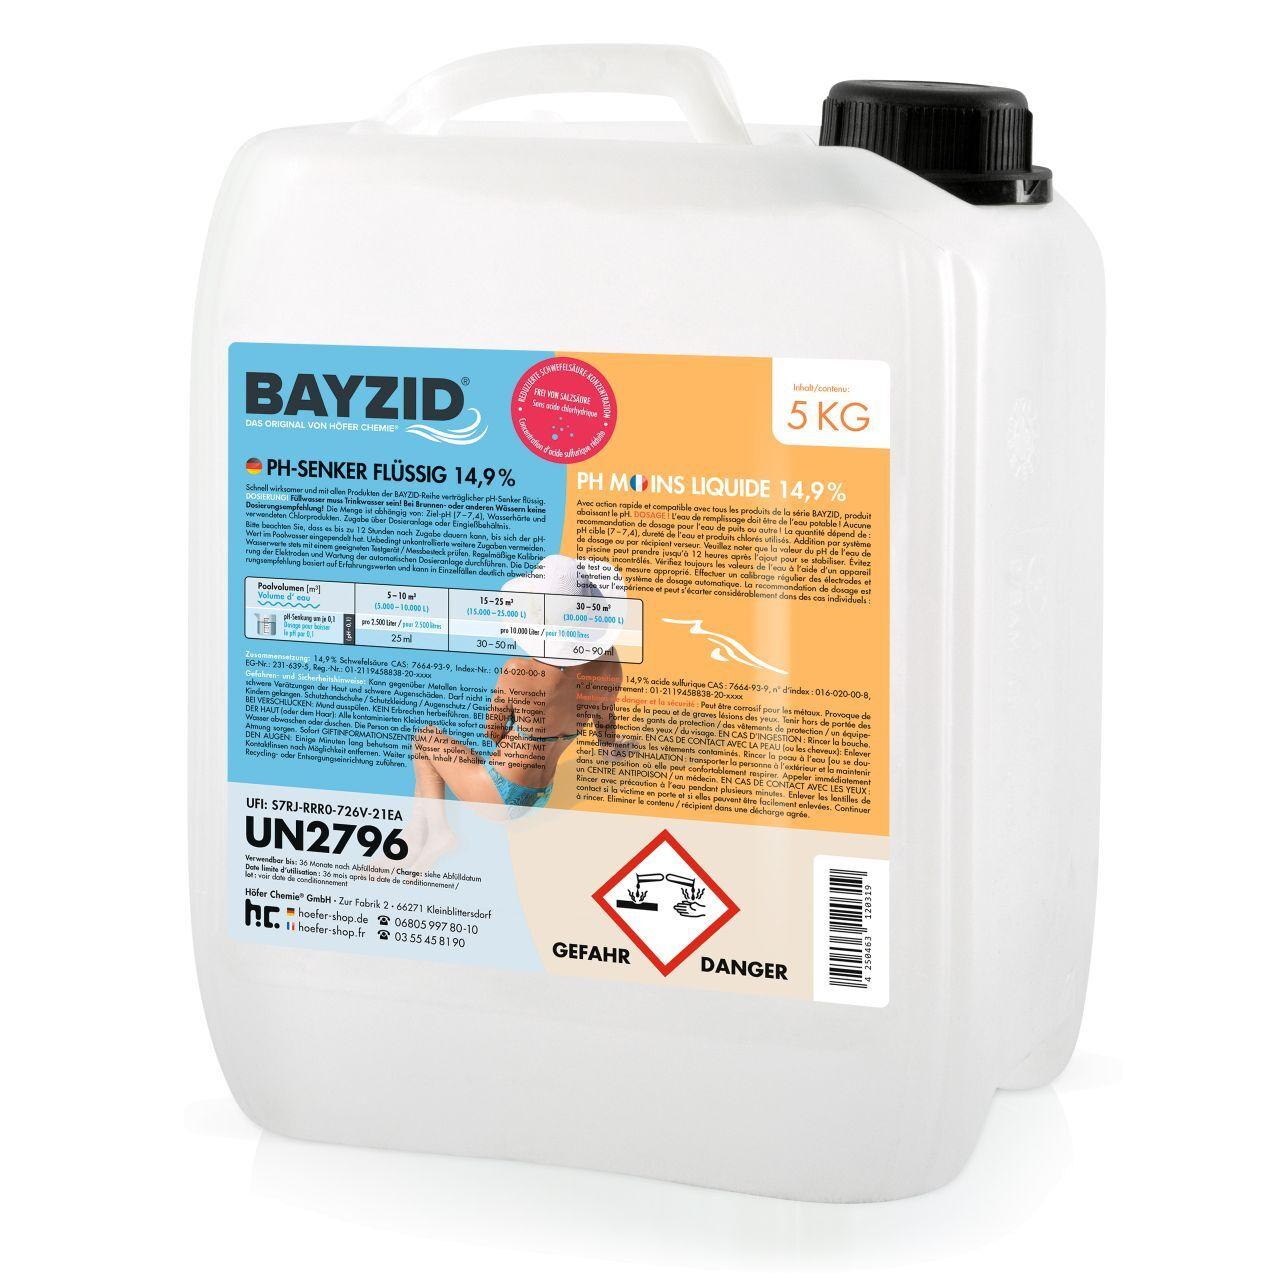 BAYZID 5 kg pH moins liquide (1 x 5 kg)